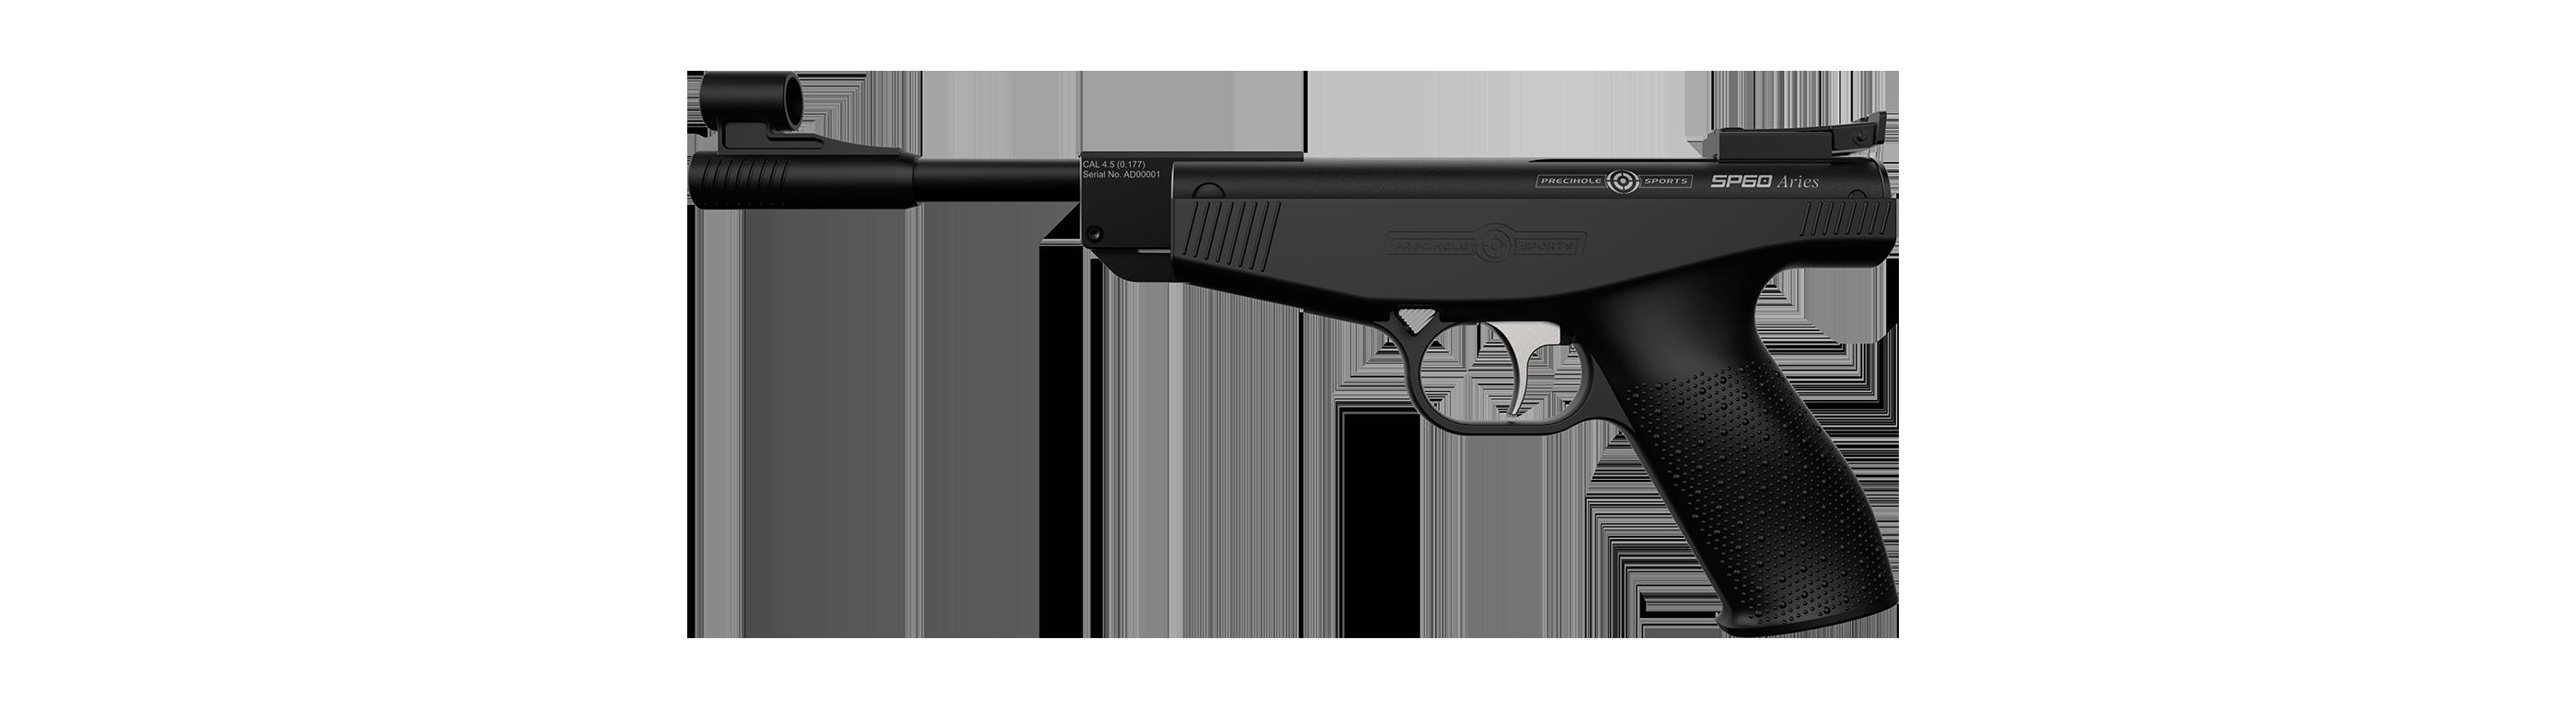 SP60 air pistol, india's best break barrel air pistol